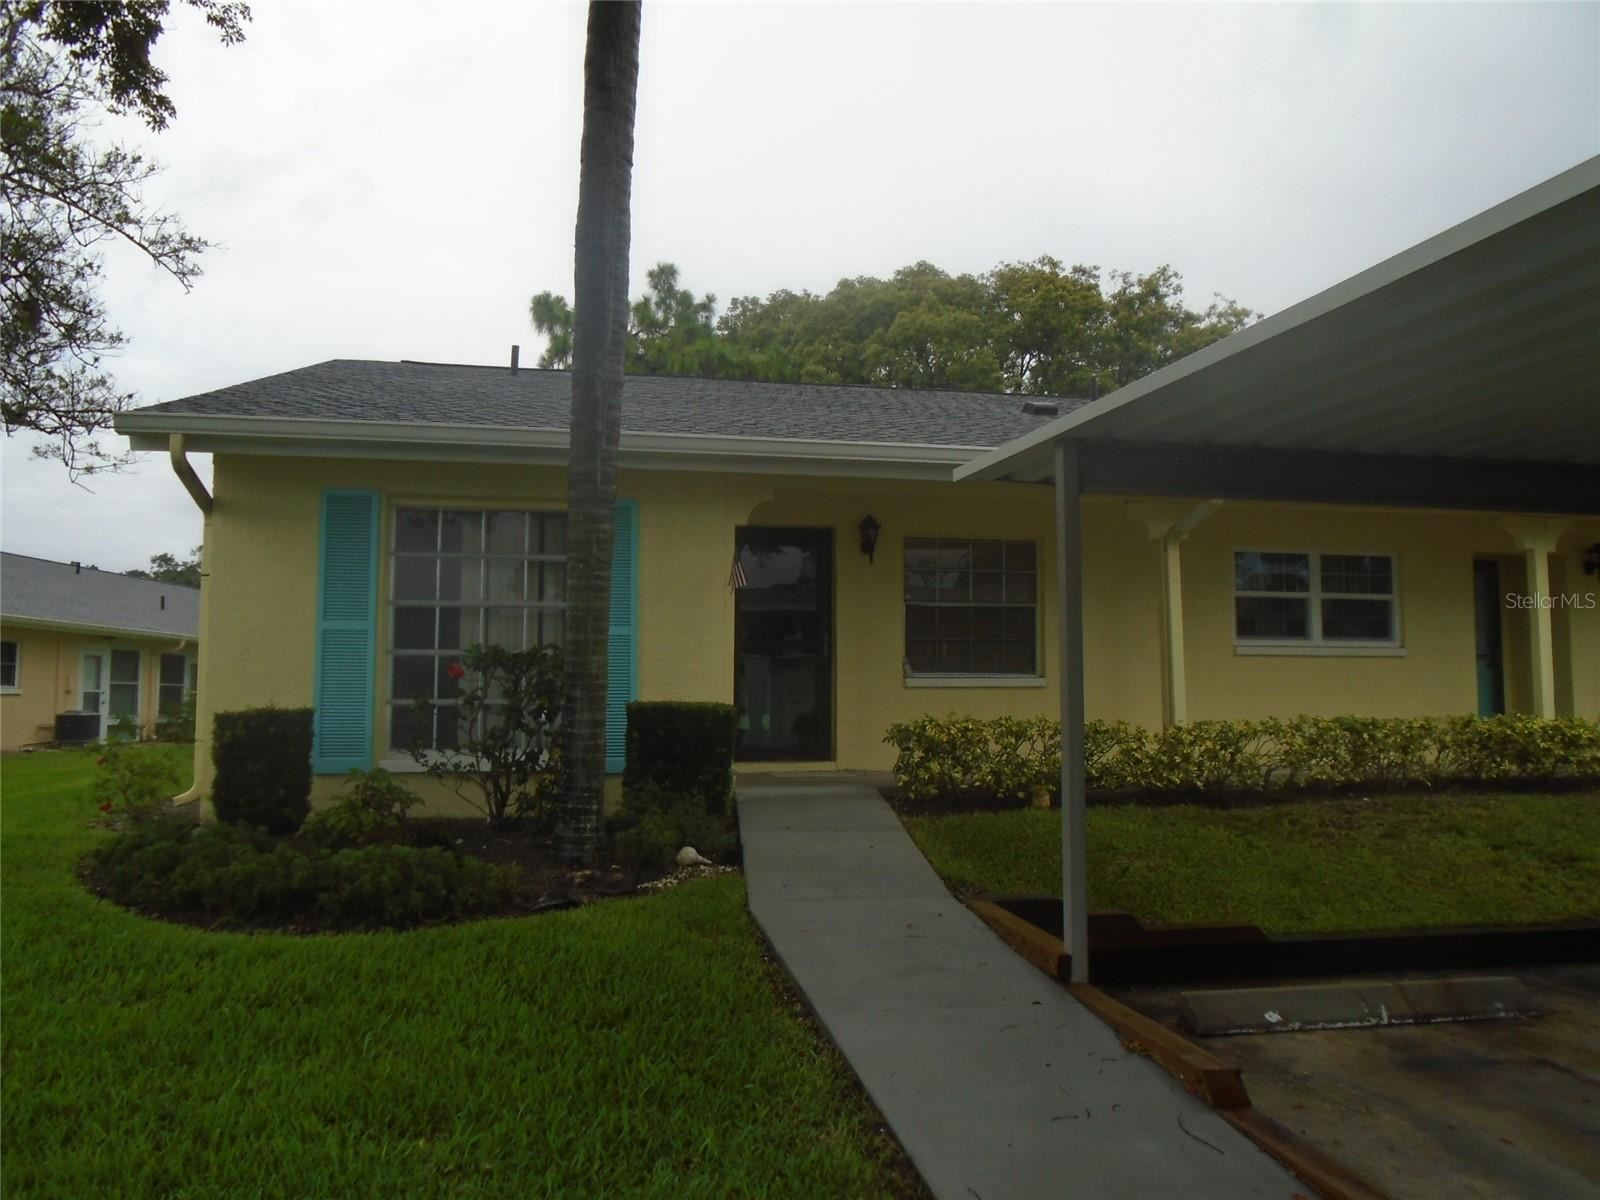 2465 NORTHSIDE DRIVE #2201, Clearwater, FL 33761 - #: U8129529